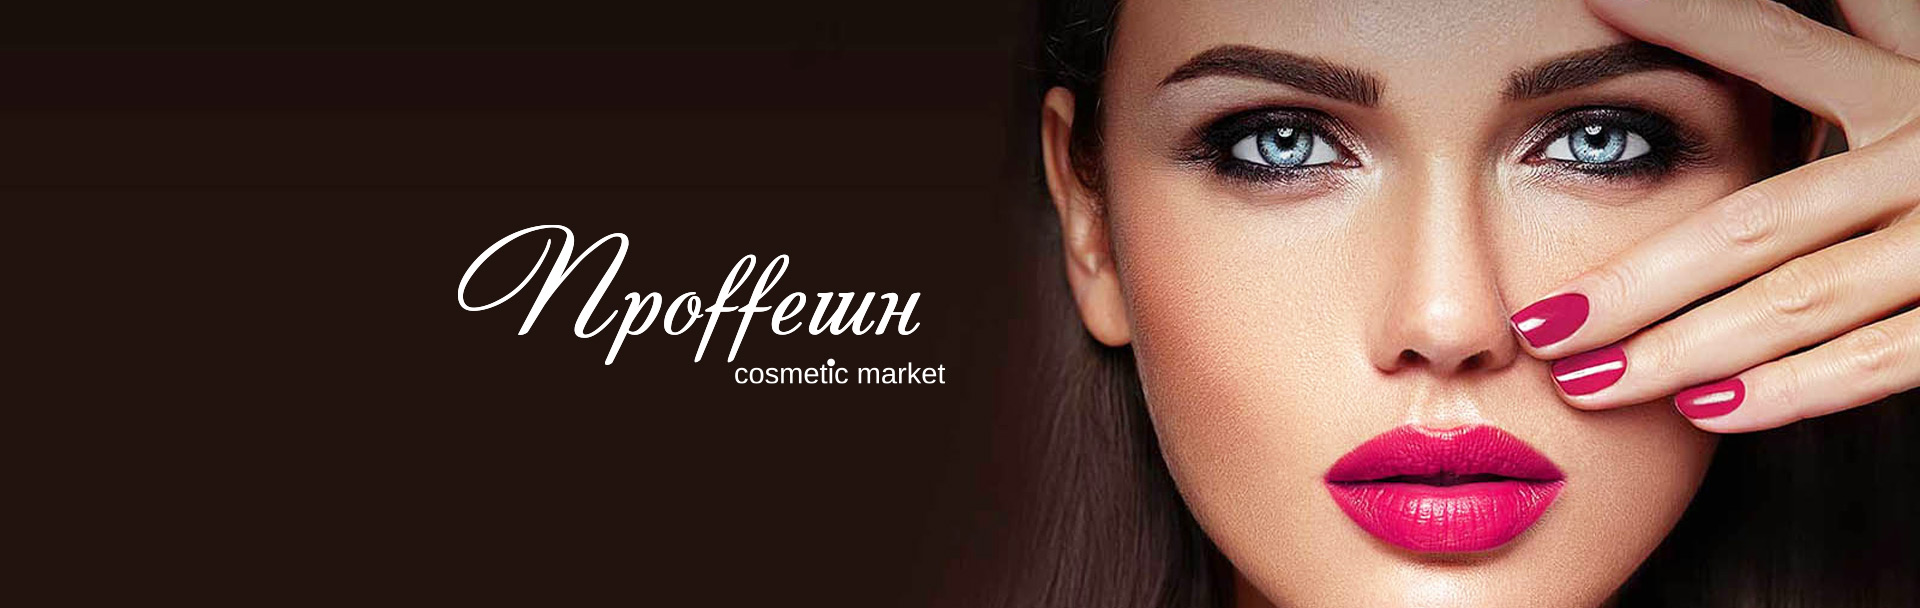 ПРОFFЕШН cosmetic market